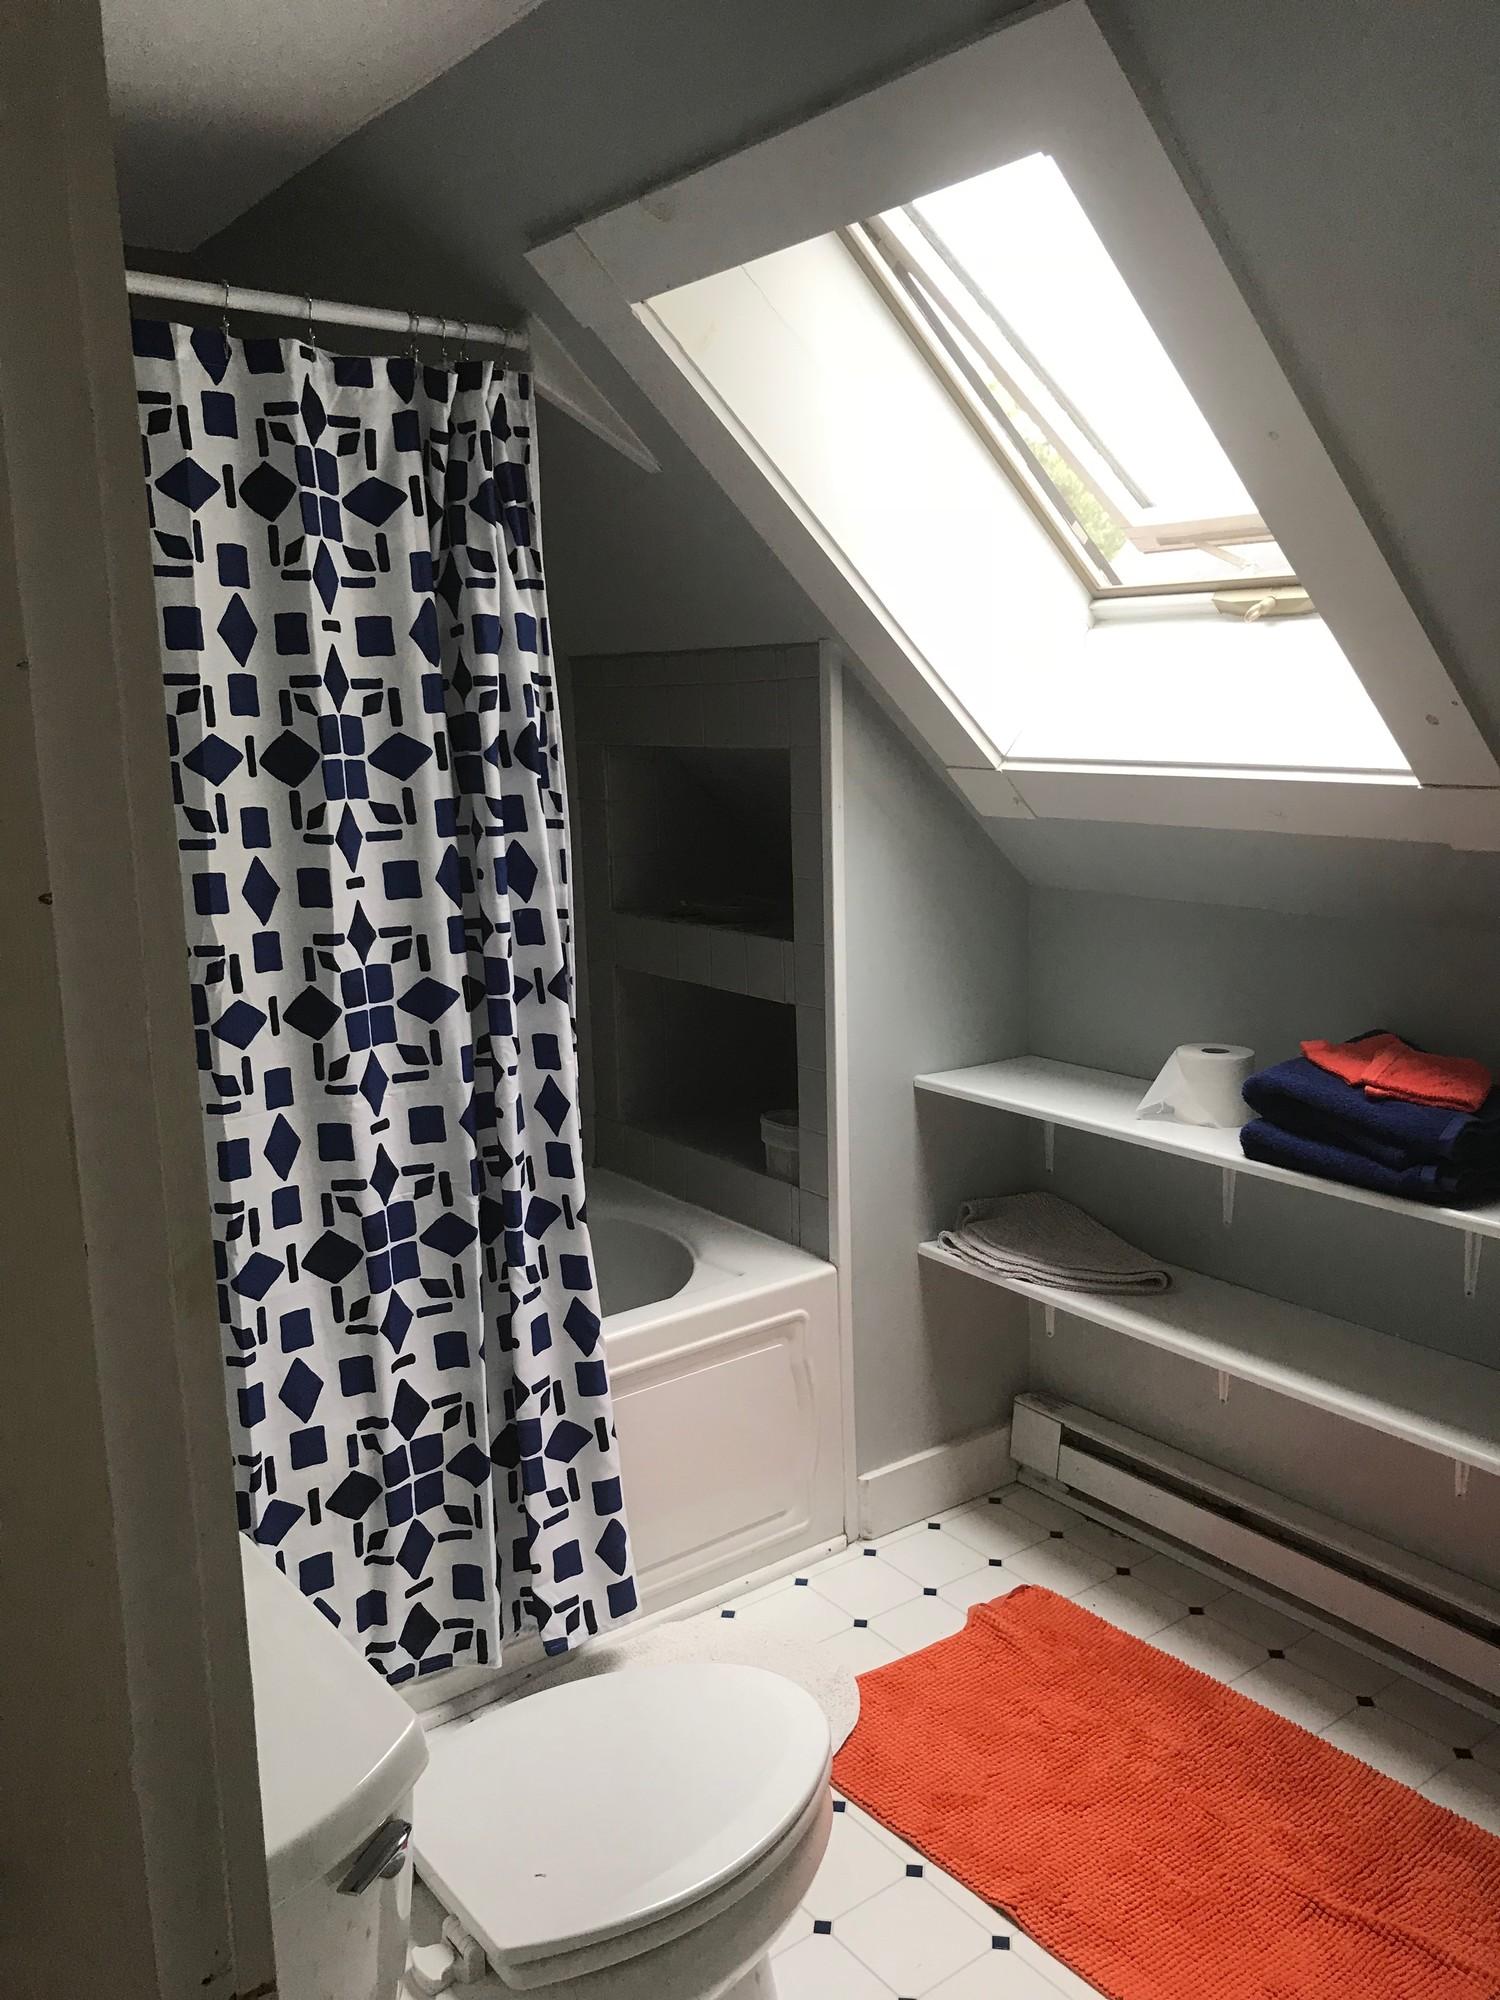 Private room with private bath